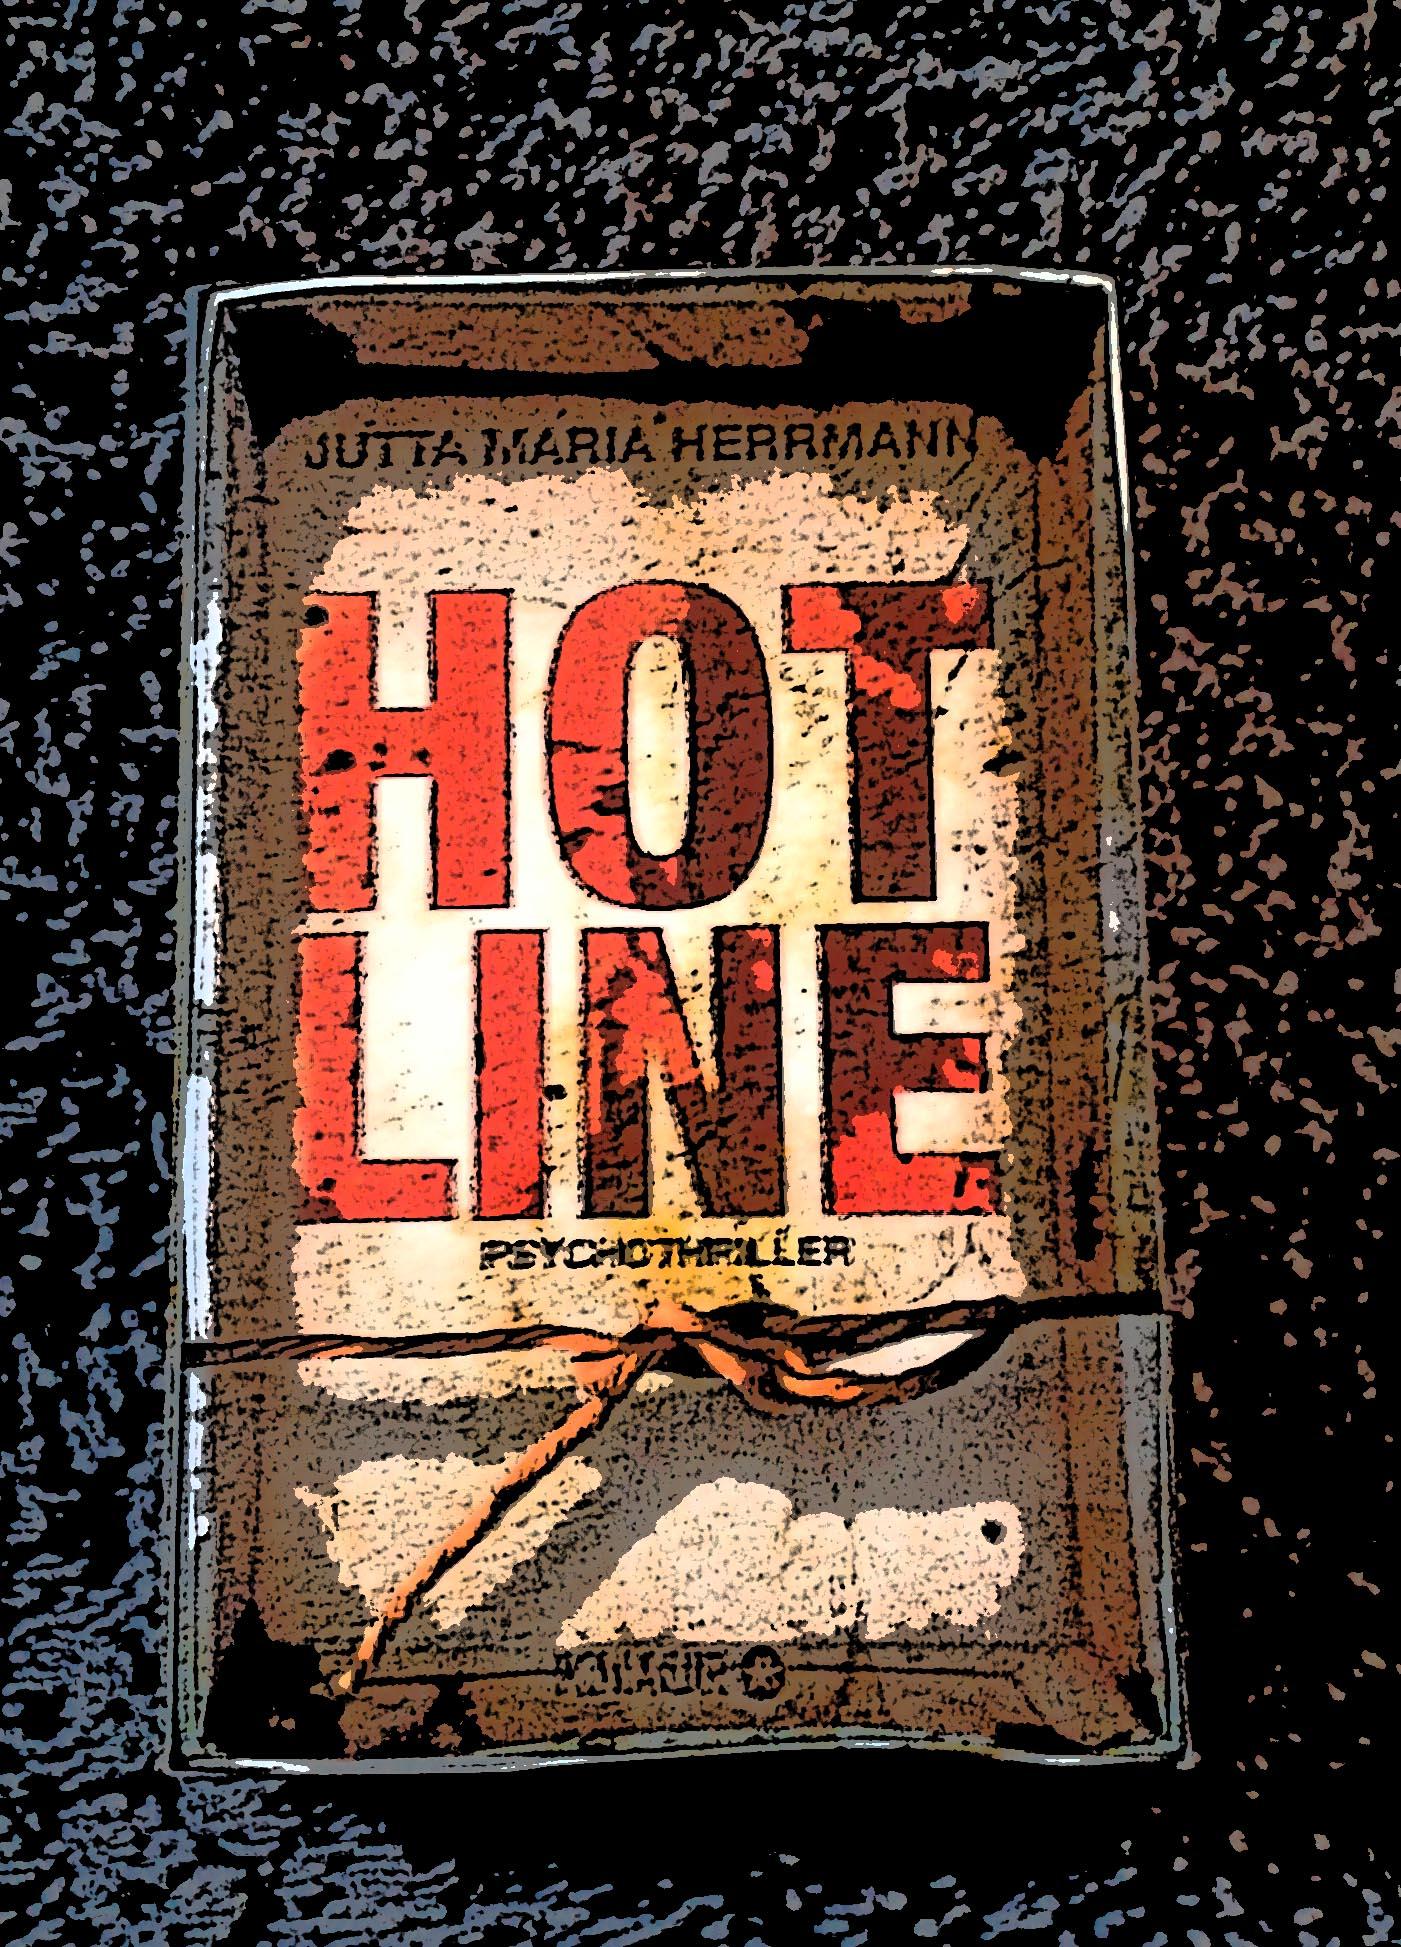 Jutta Maria Herrmann-Hotline